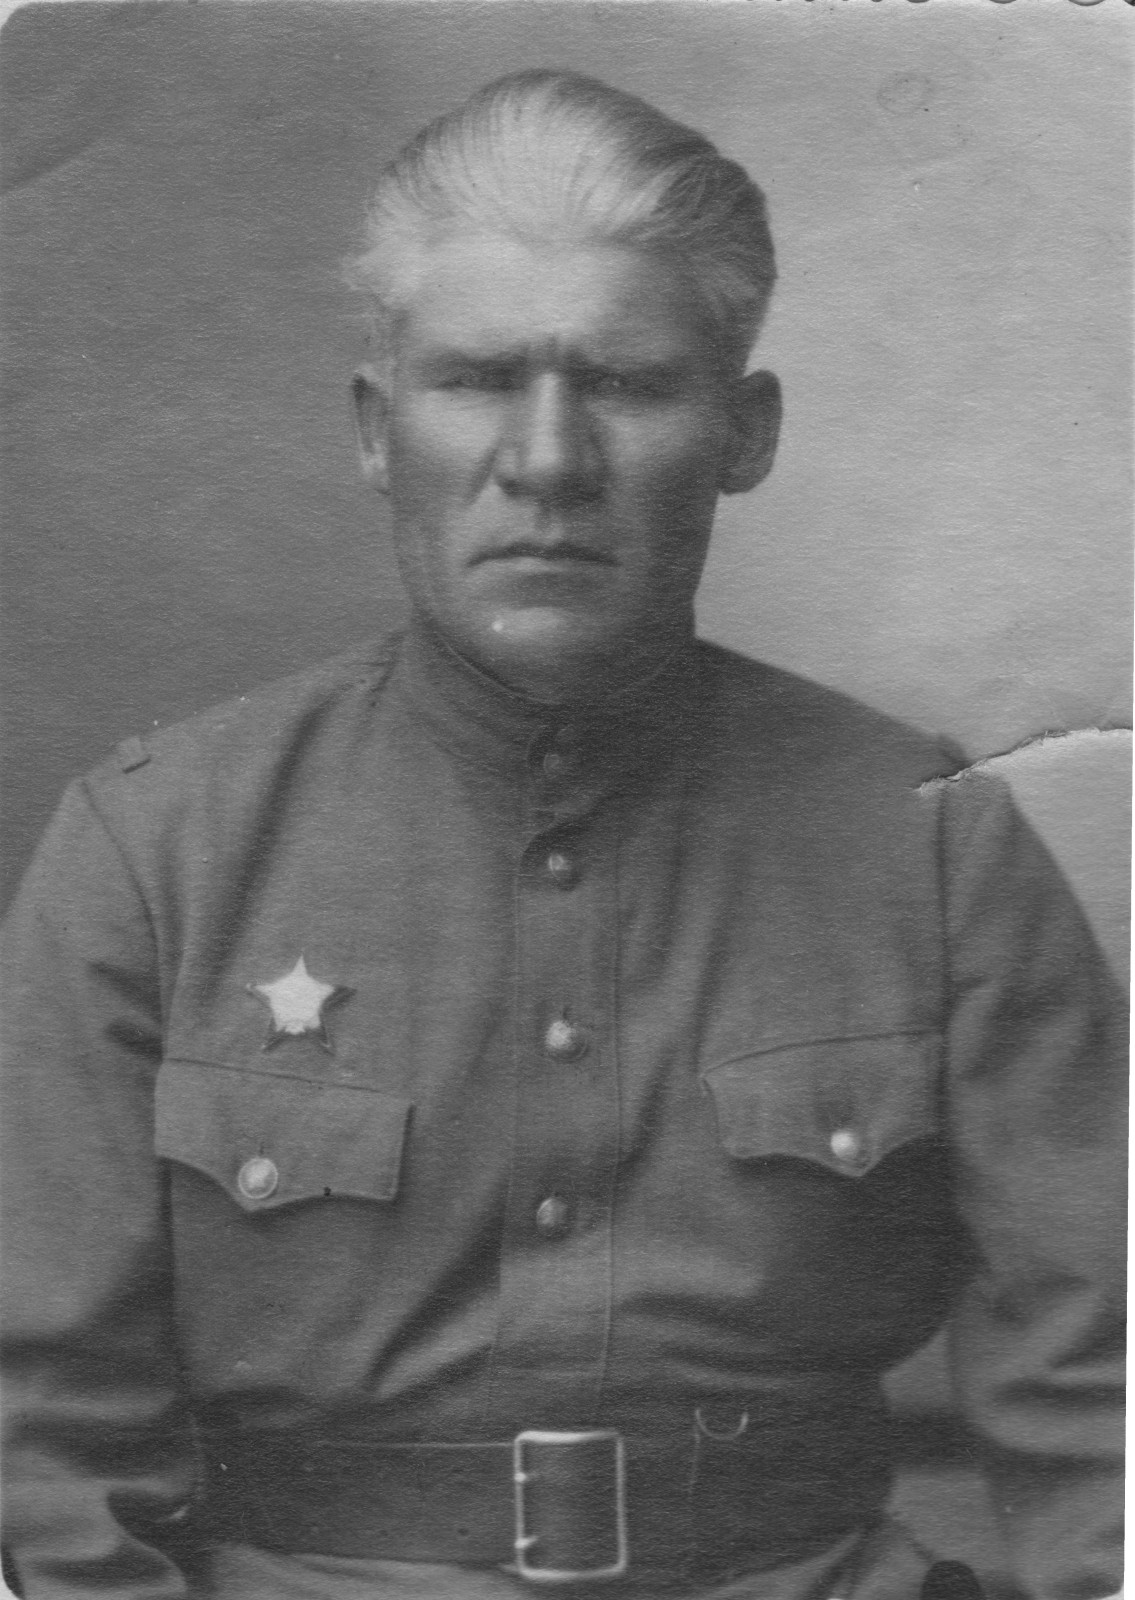 Дуров Н.А. 1945. Фото Маслова А.Д.